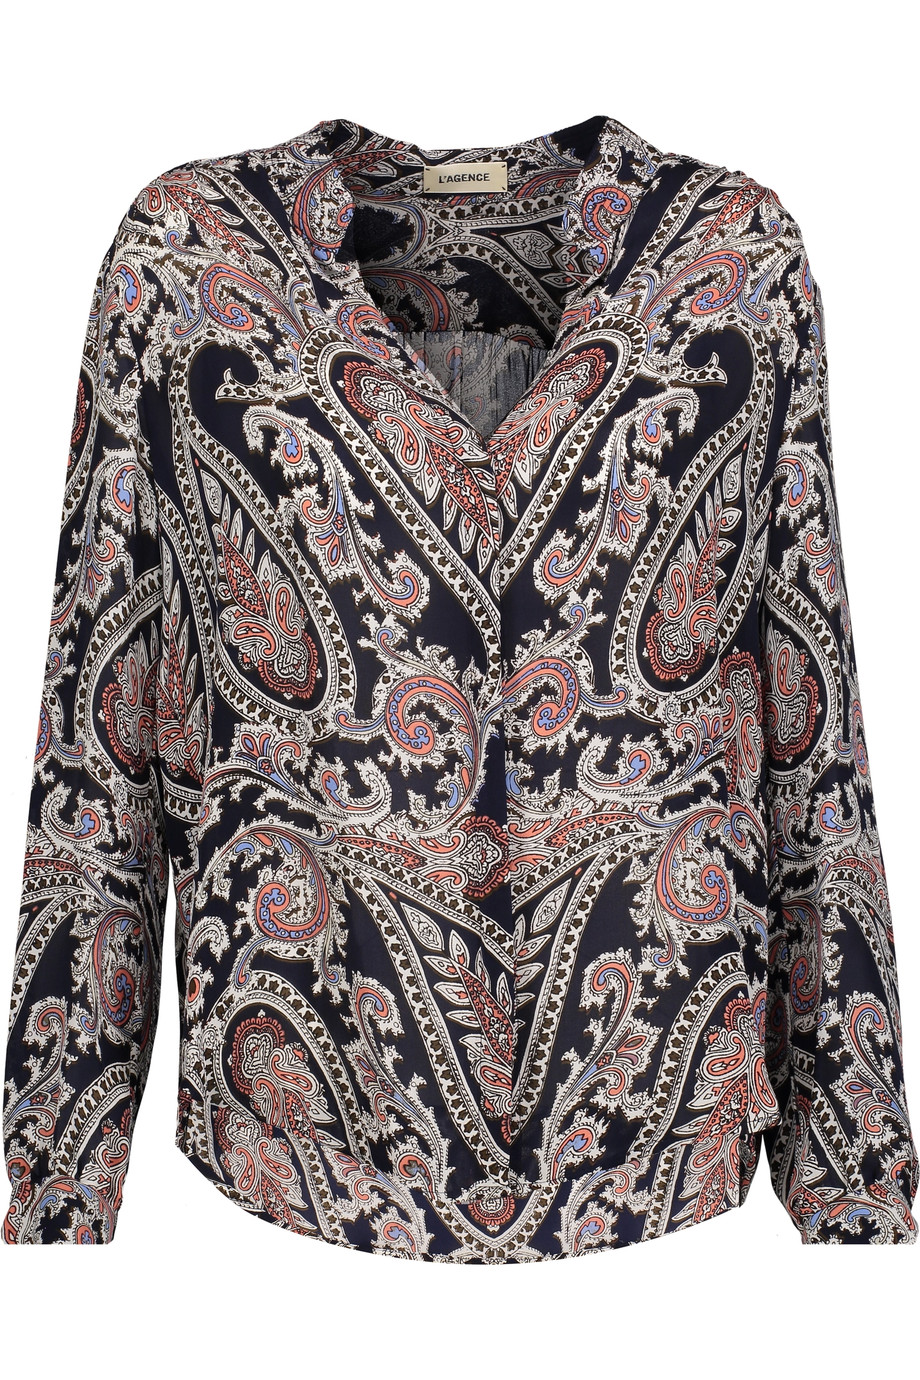 L Agence Silks Bianca printed silk crepe de chine shirt